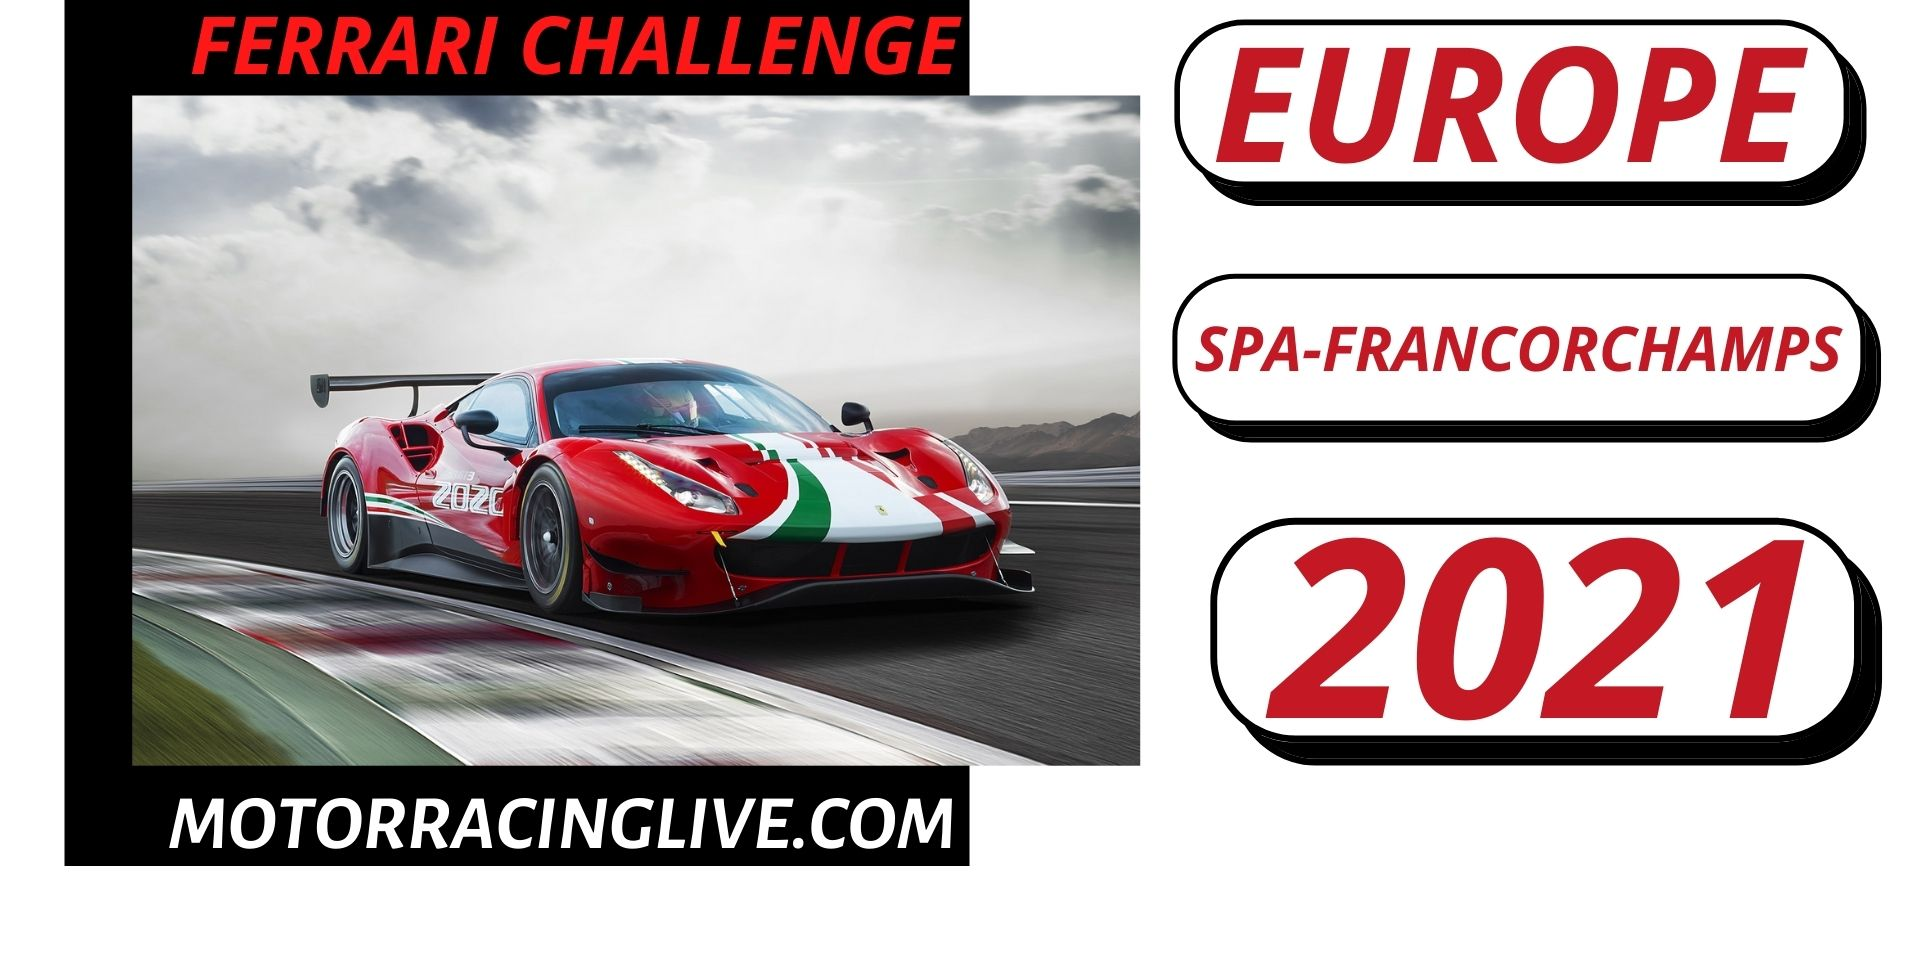 SPA Francorchamps Ferrari Challenge Europe Live Stream 2021